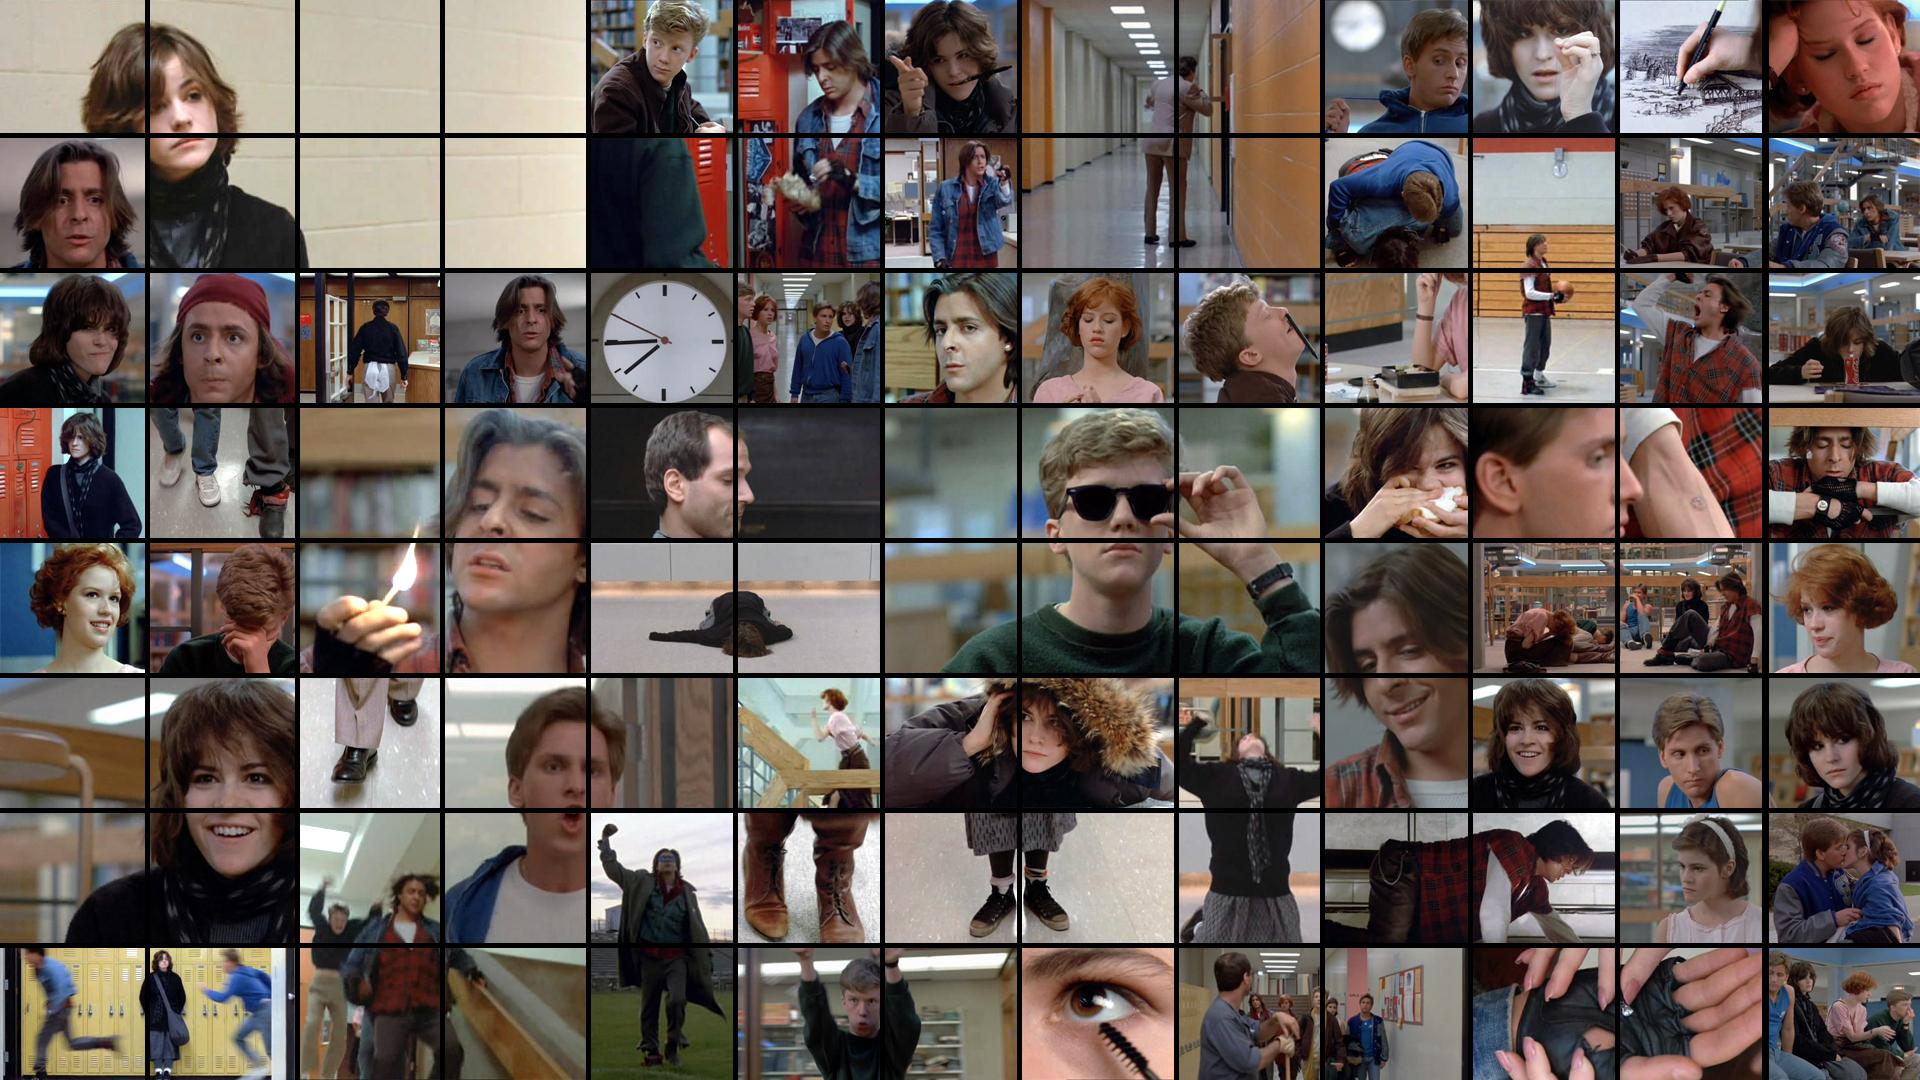 Best Wallpaper Movie Collage - the_breakfast_club_wallpaper_2_by_radiolab  Graphic_142720.jpg